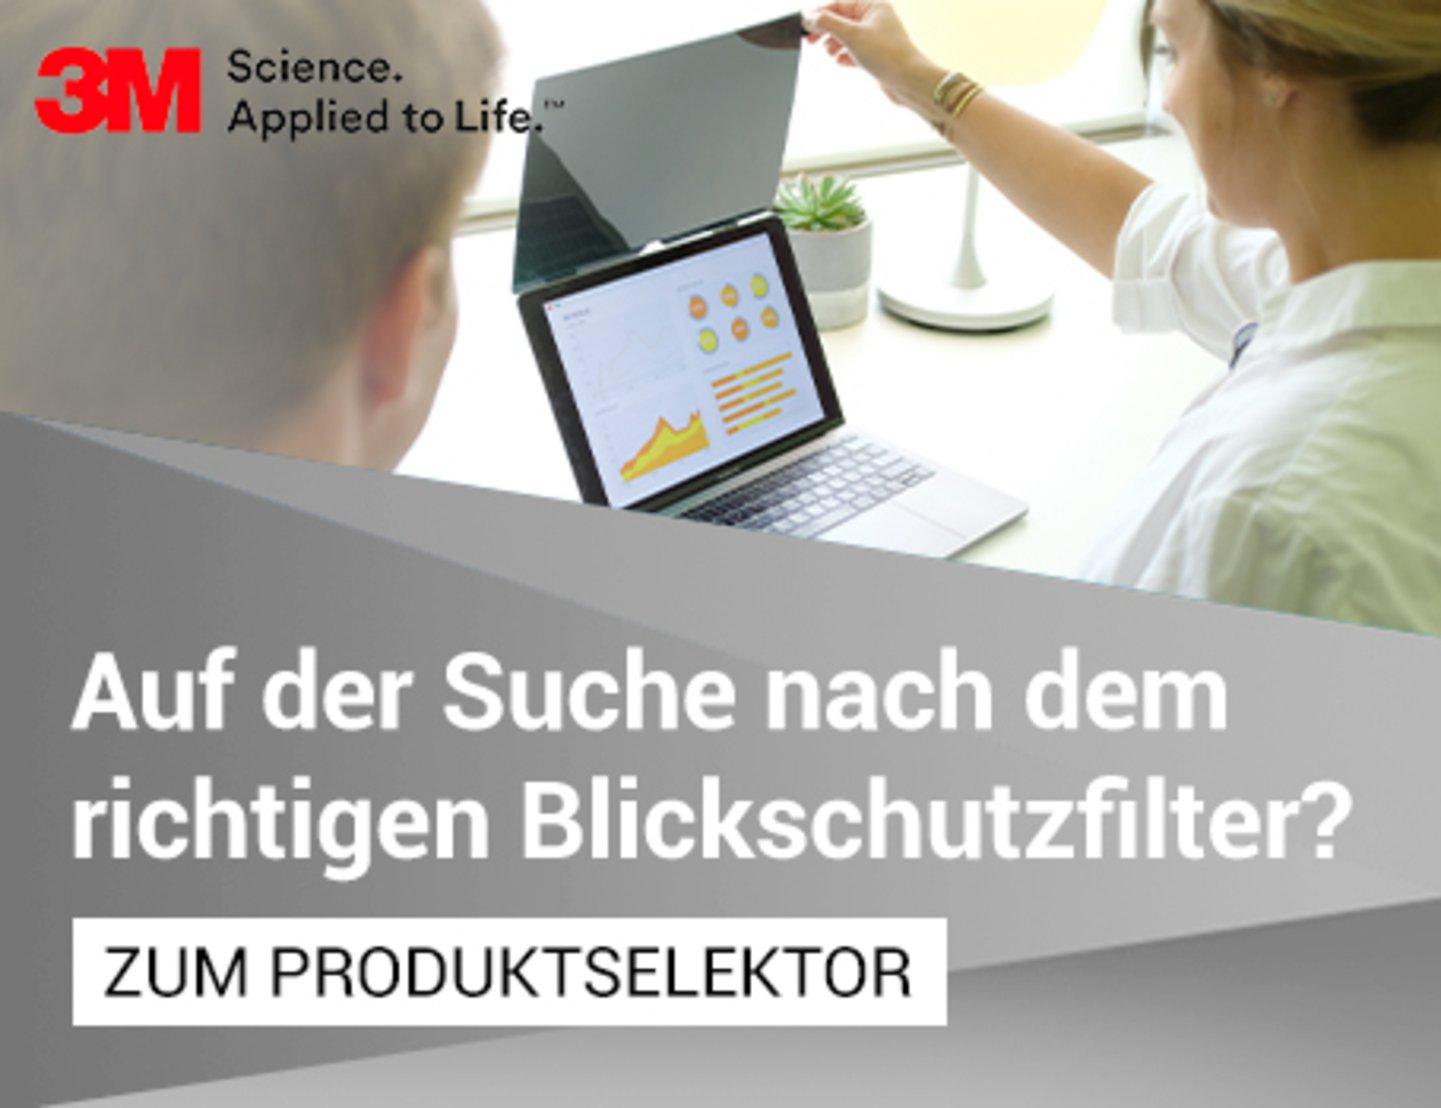 Blickschutzfilter Produktselektor